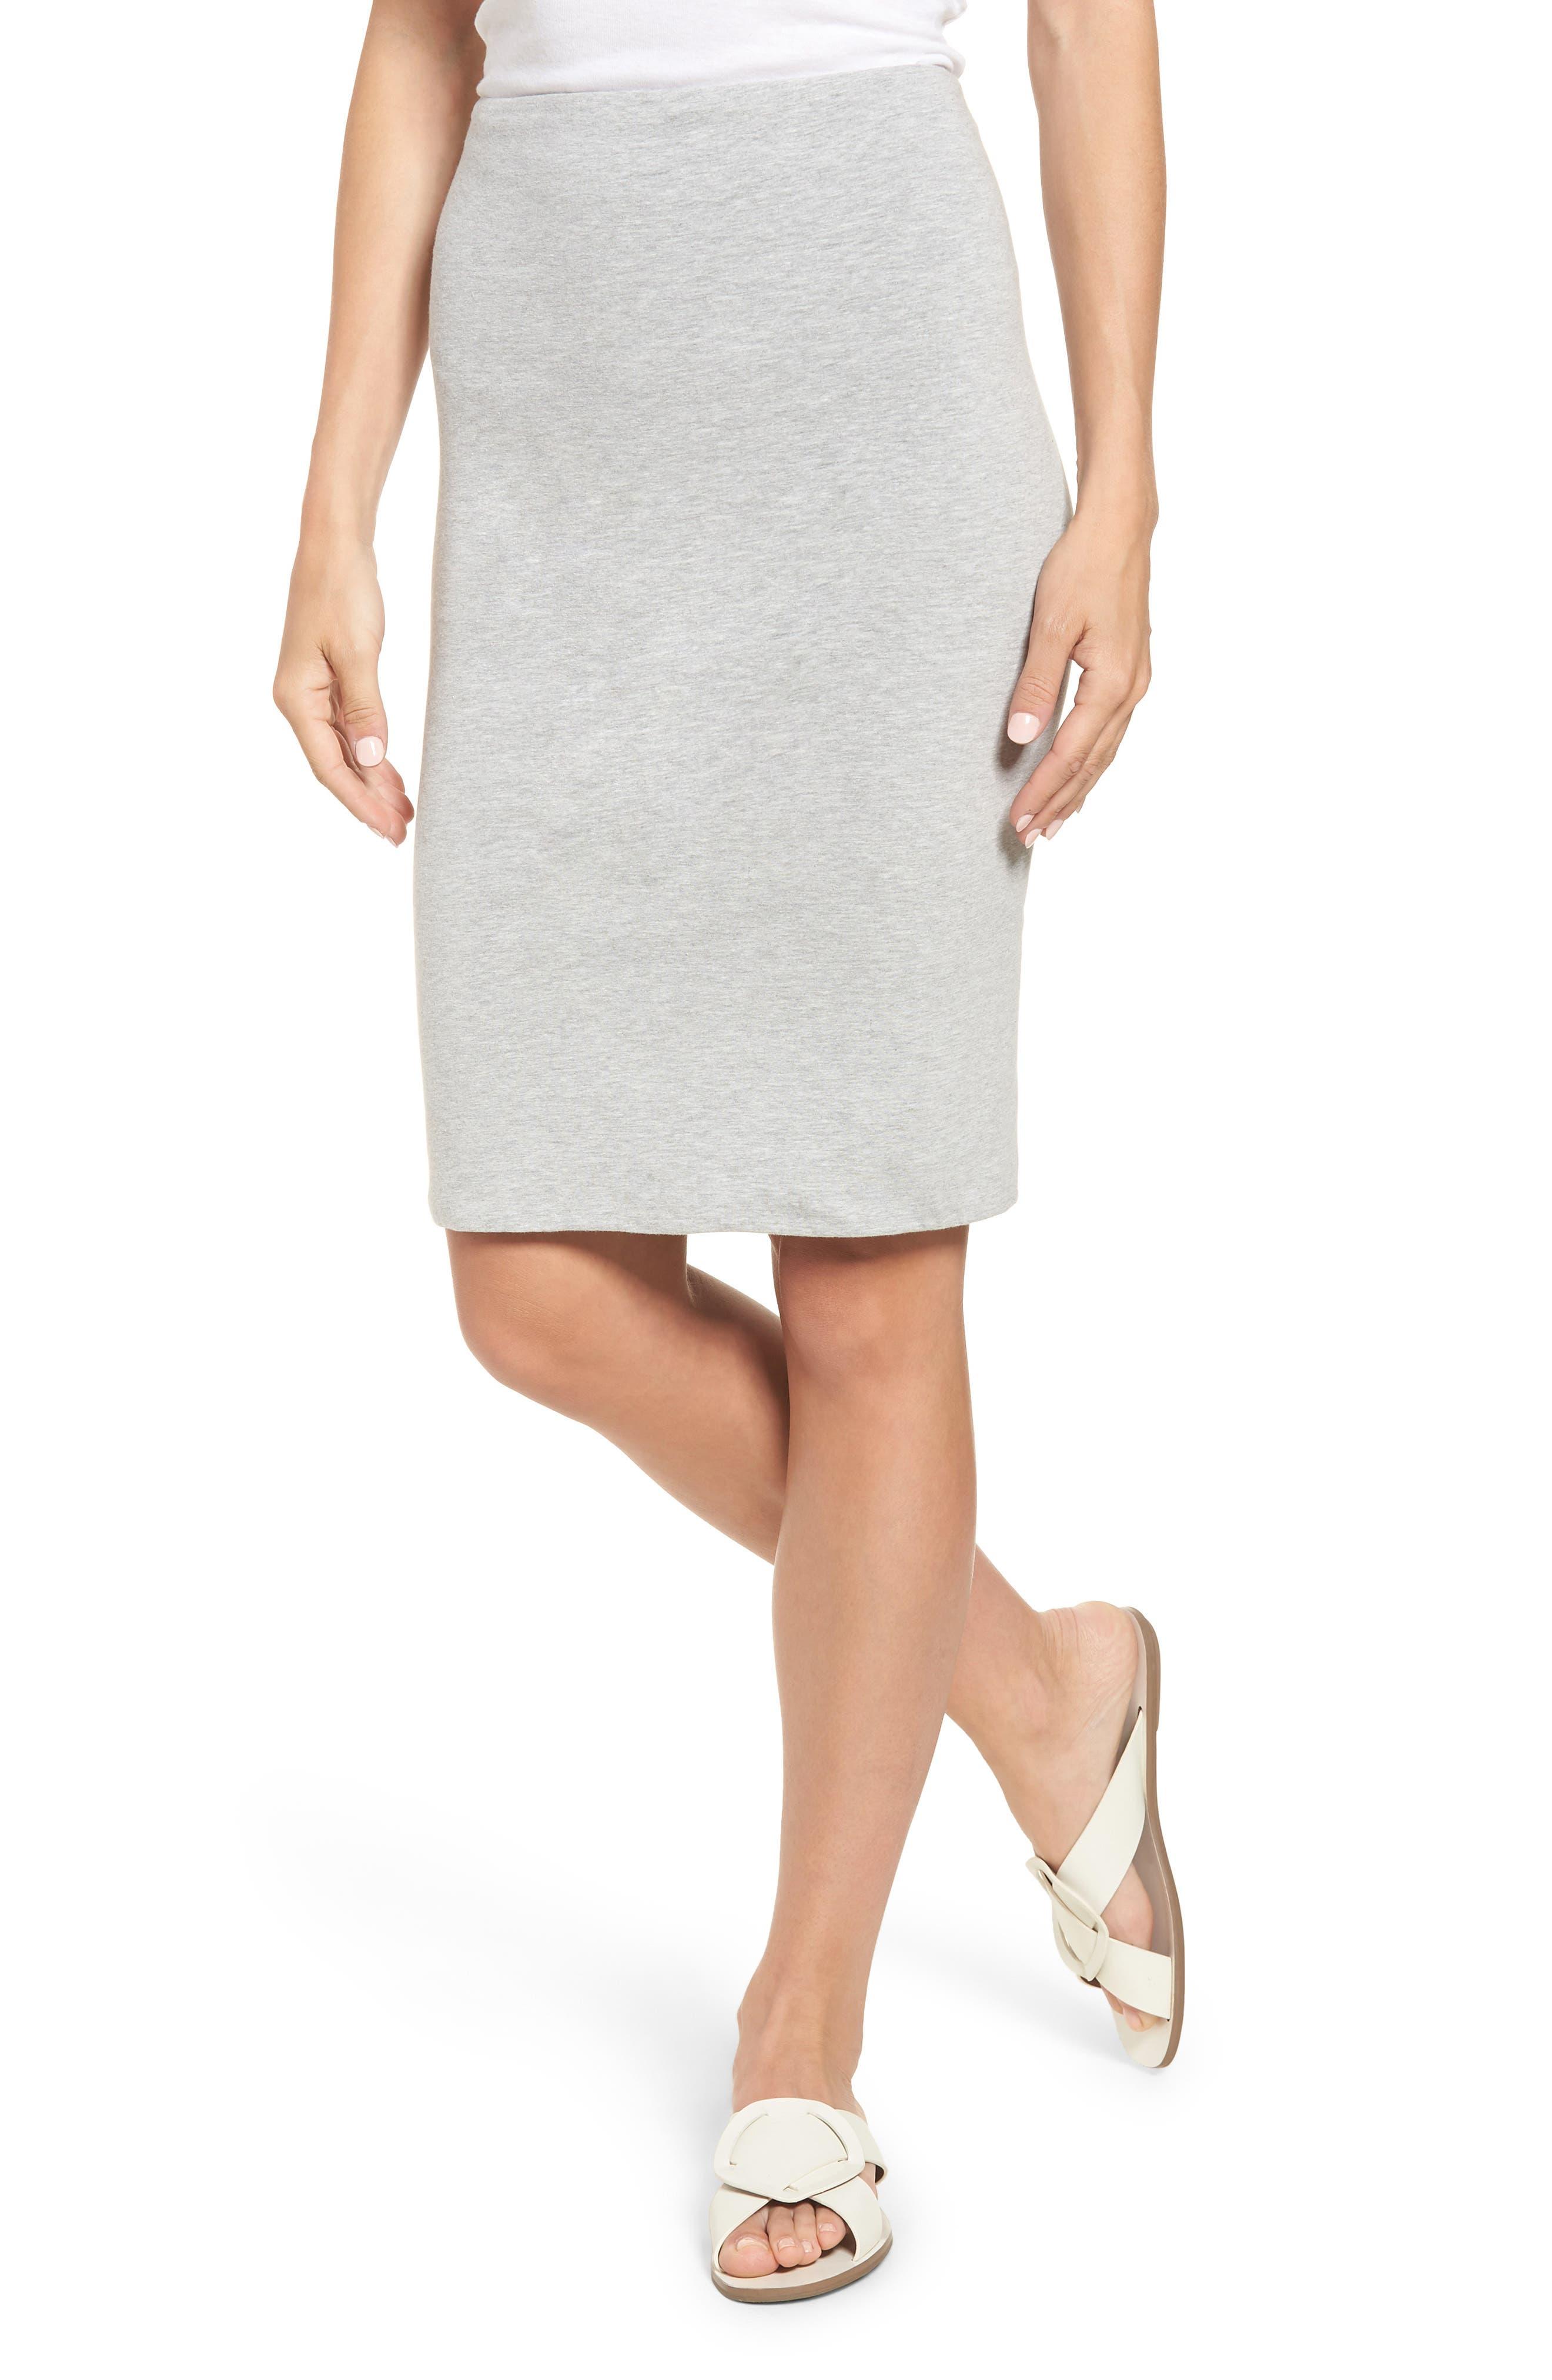 x Hi Sugarplum! Fornillo Pencil Skirt,                             Main thumbnail 1, color,                             055